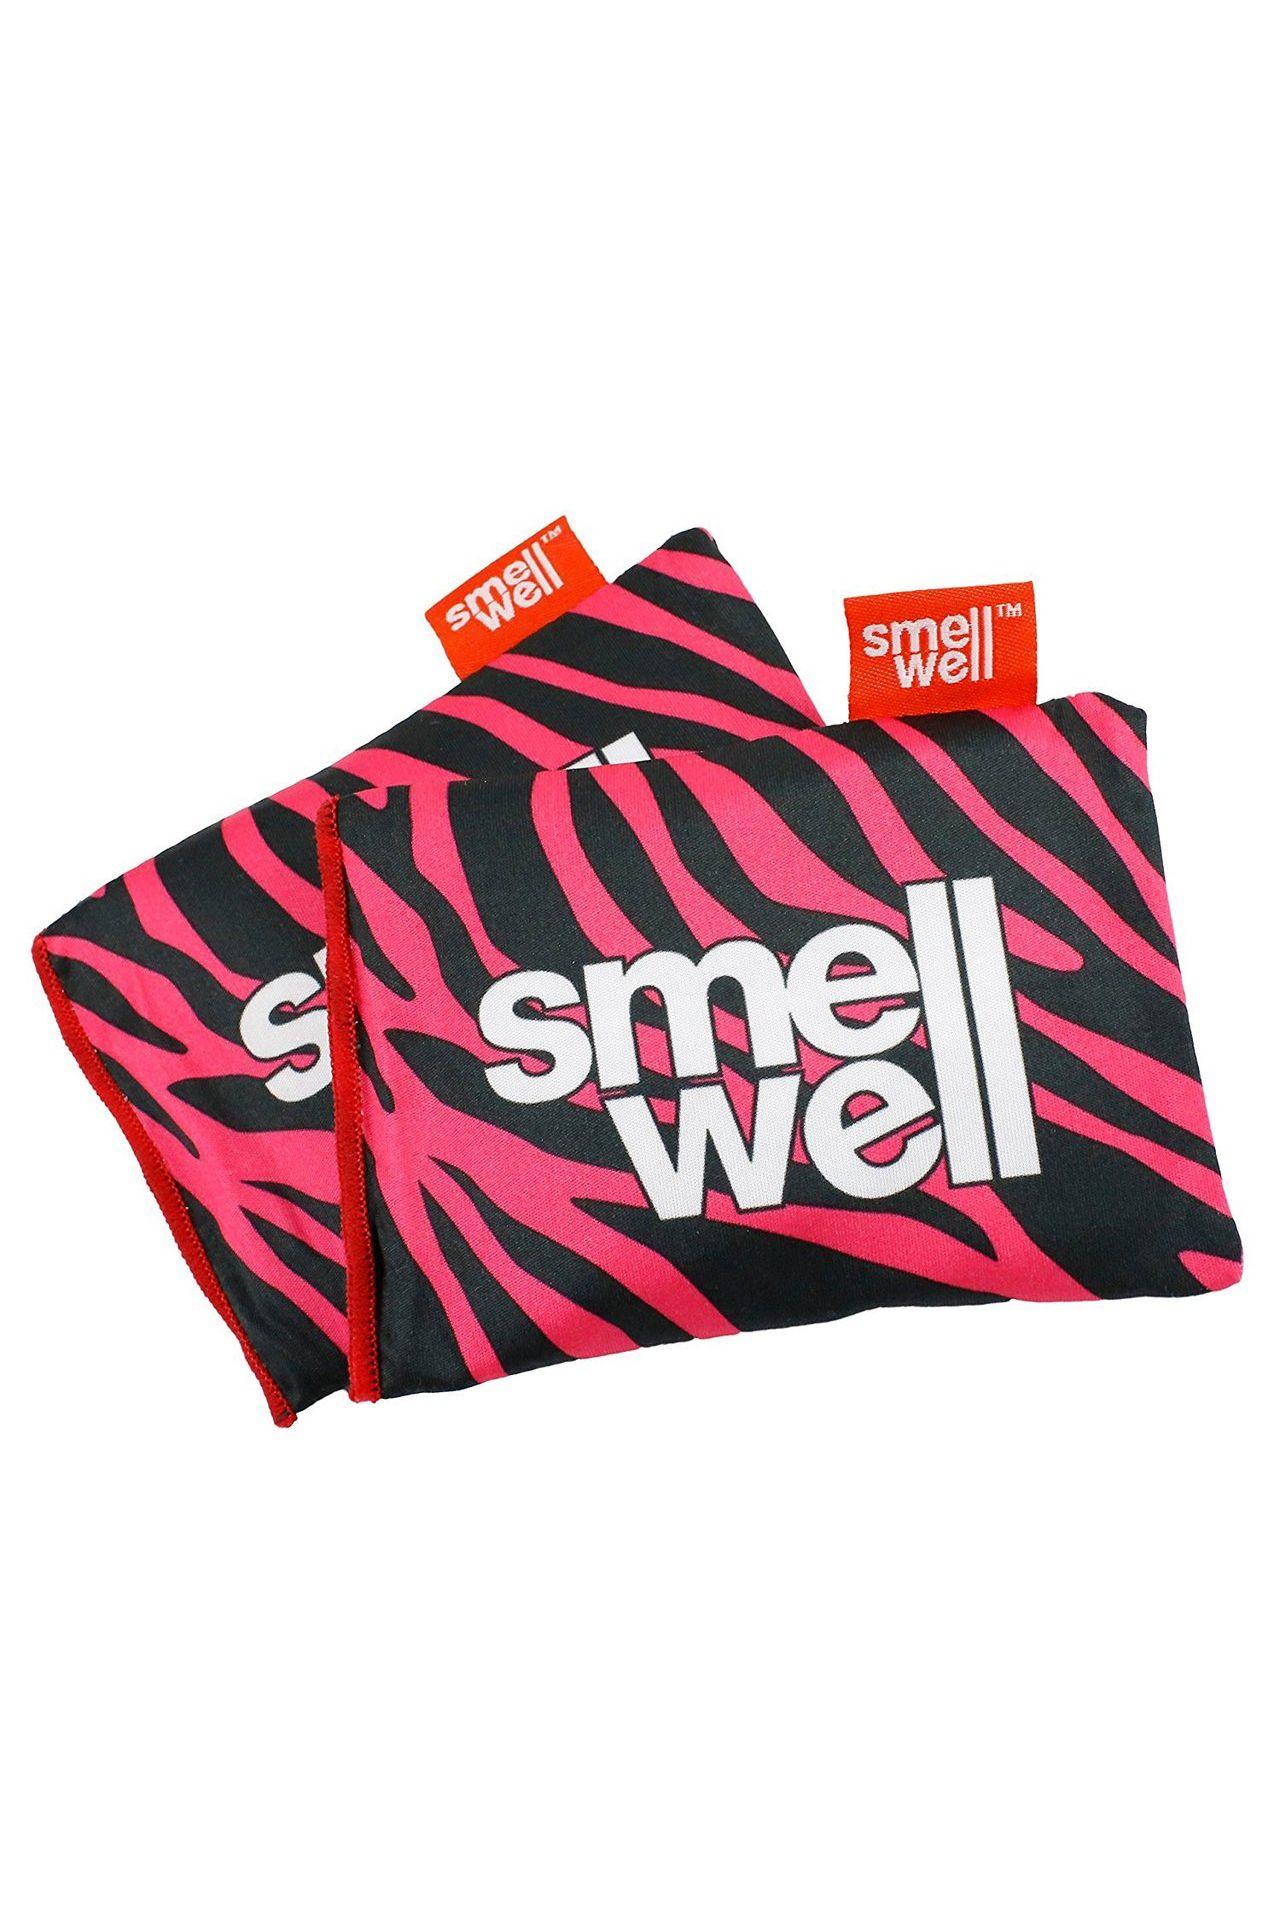 DV Smell Well SHOE DEODORIZER & NATURAL ODOR ABSORBER (2PK) Pink Zebra